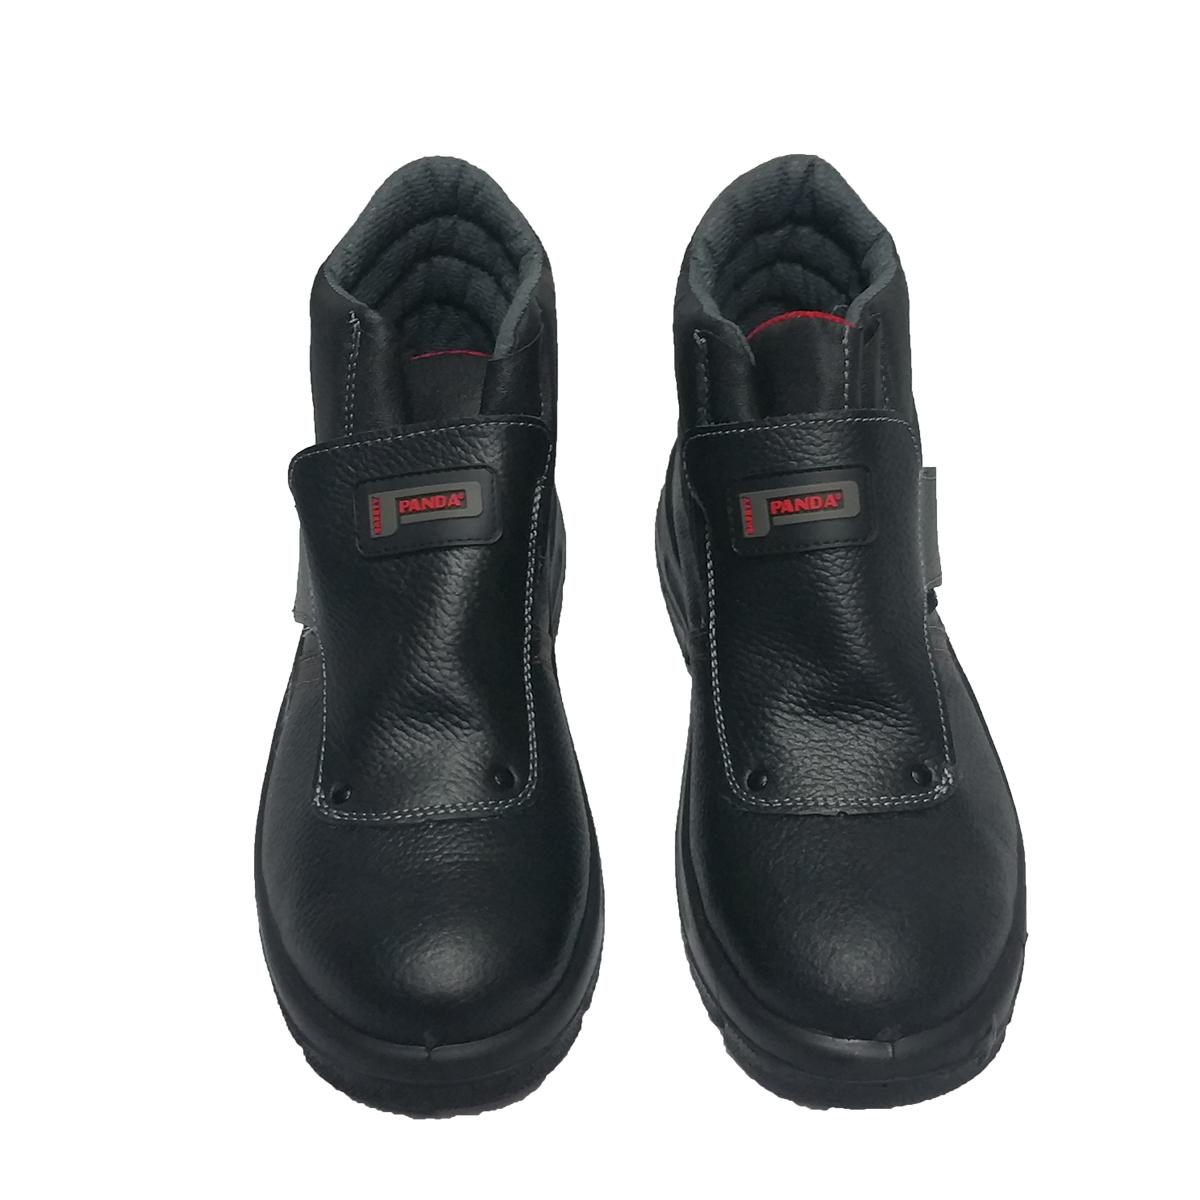 Radna cipela Panda Security na čičak